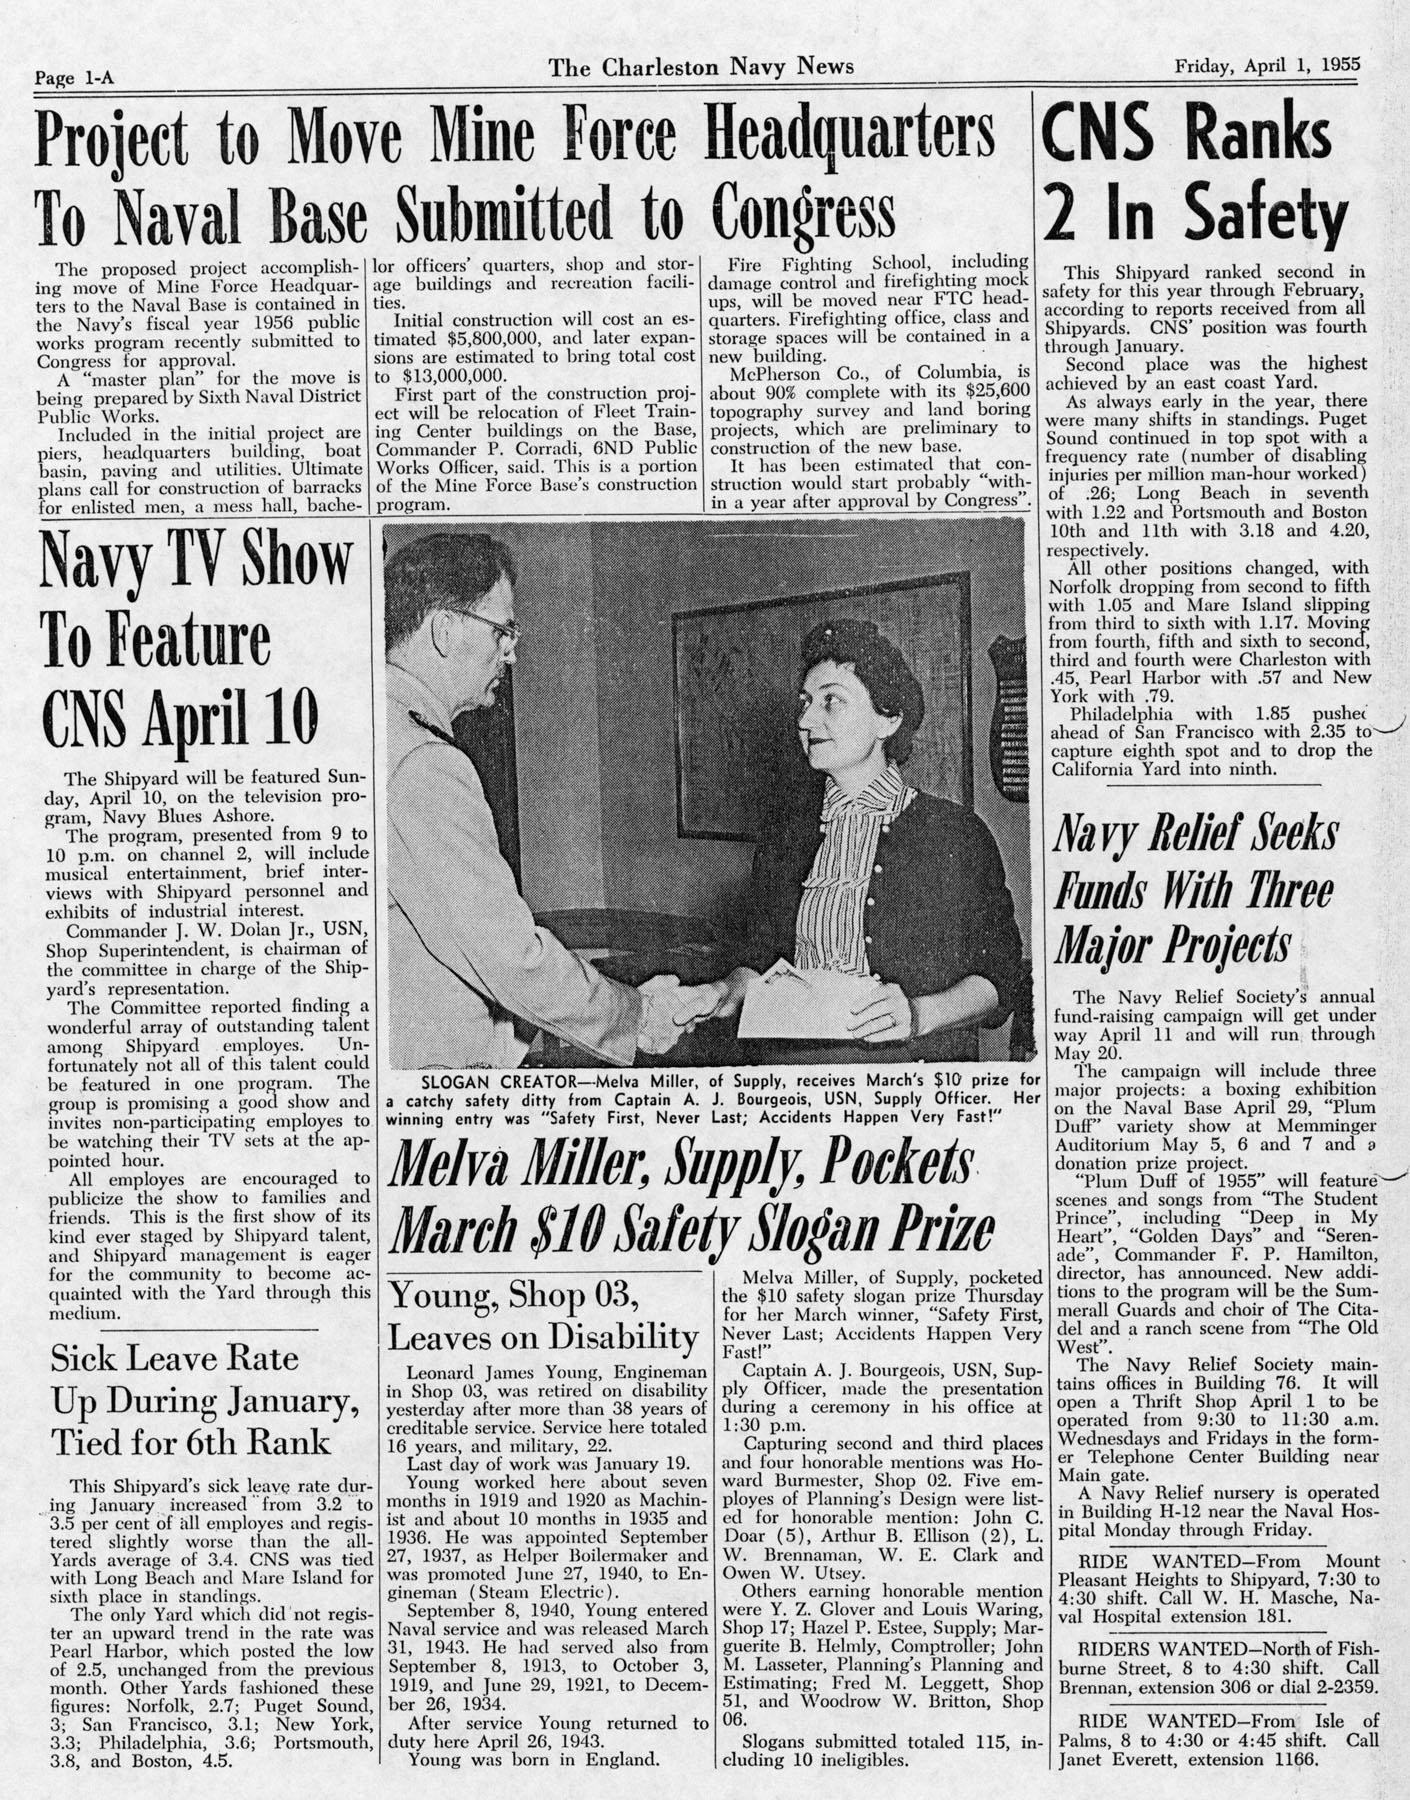 The Charleston Navy News, Volume 13, Edition 19, page ia